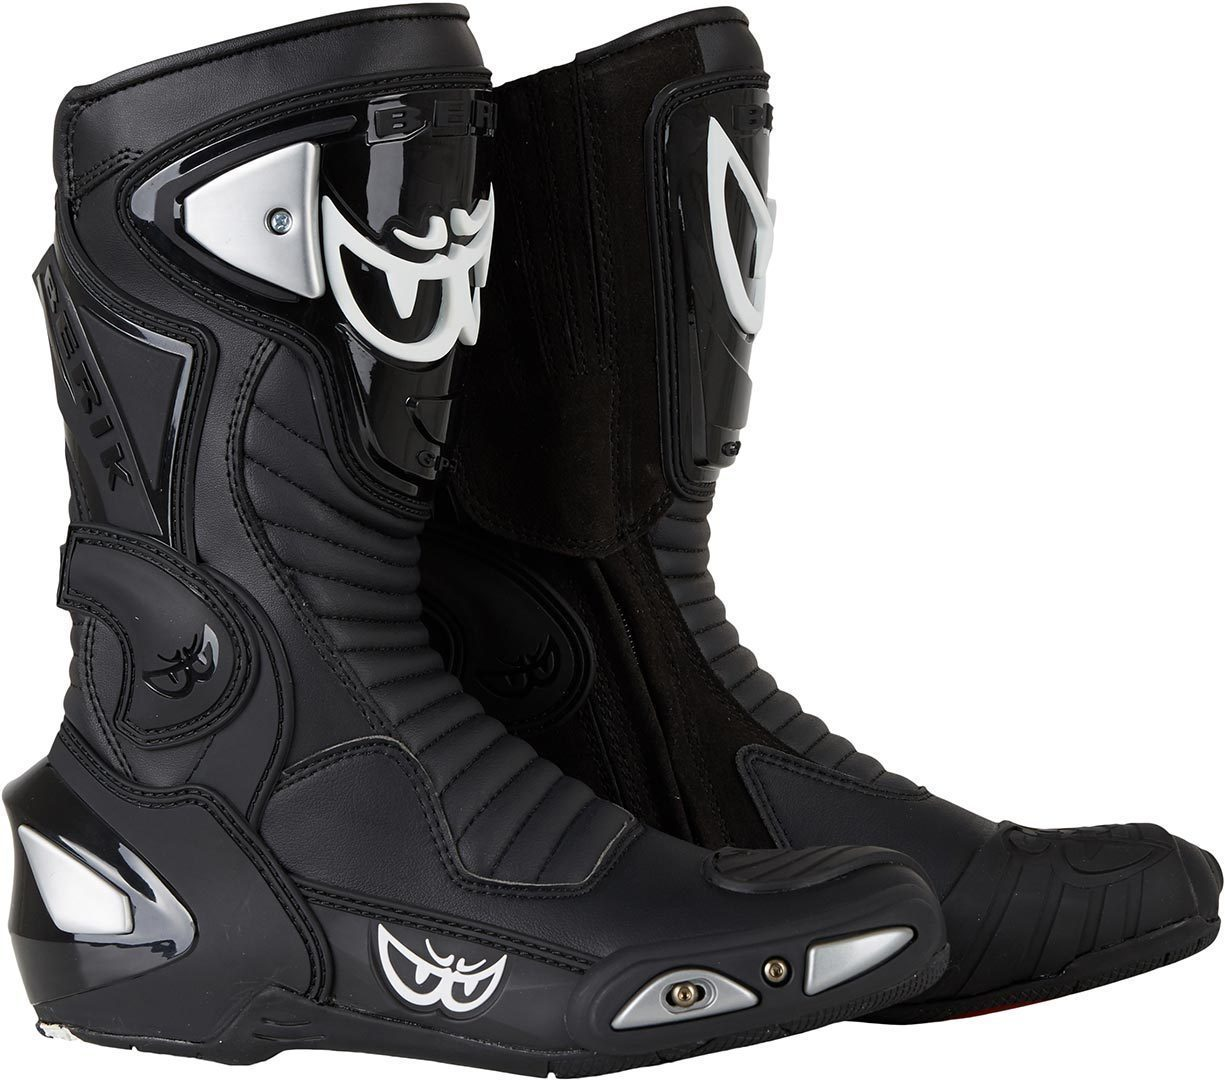 Berik Race-X Motorradstiefel, schwarz, Größe 48, schwarz, Größe 48